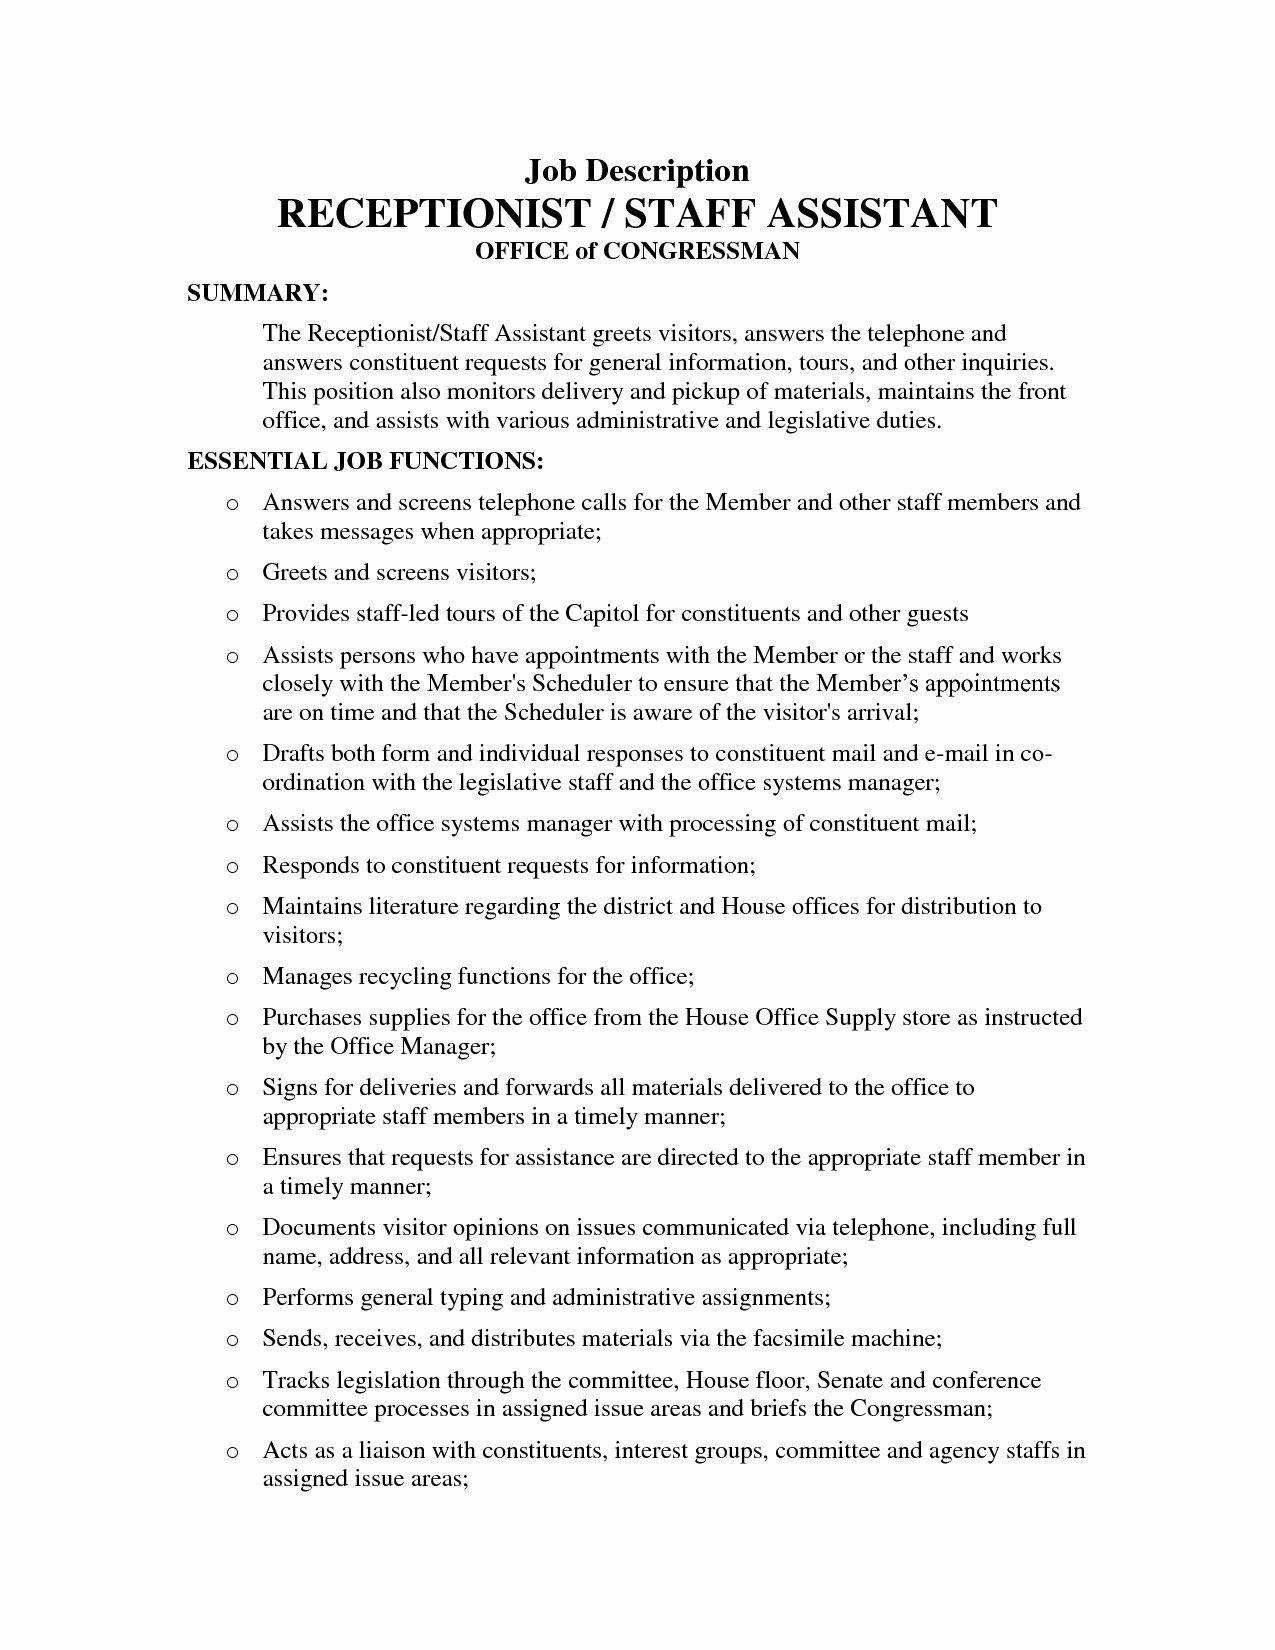 23 Medical Office Assistant Job Description Resume In